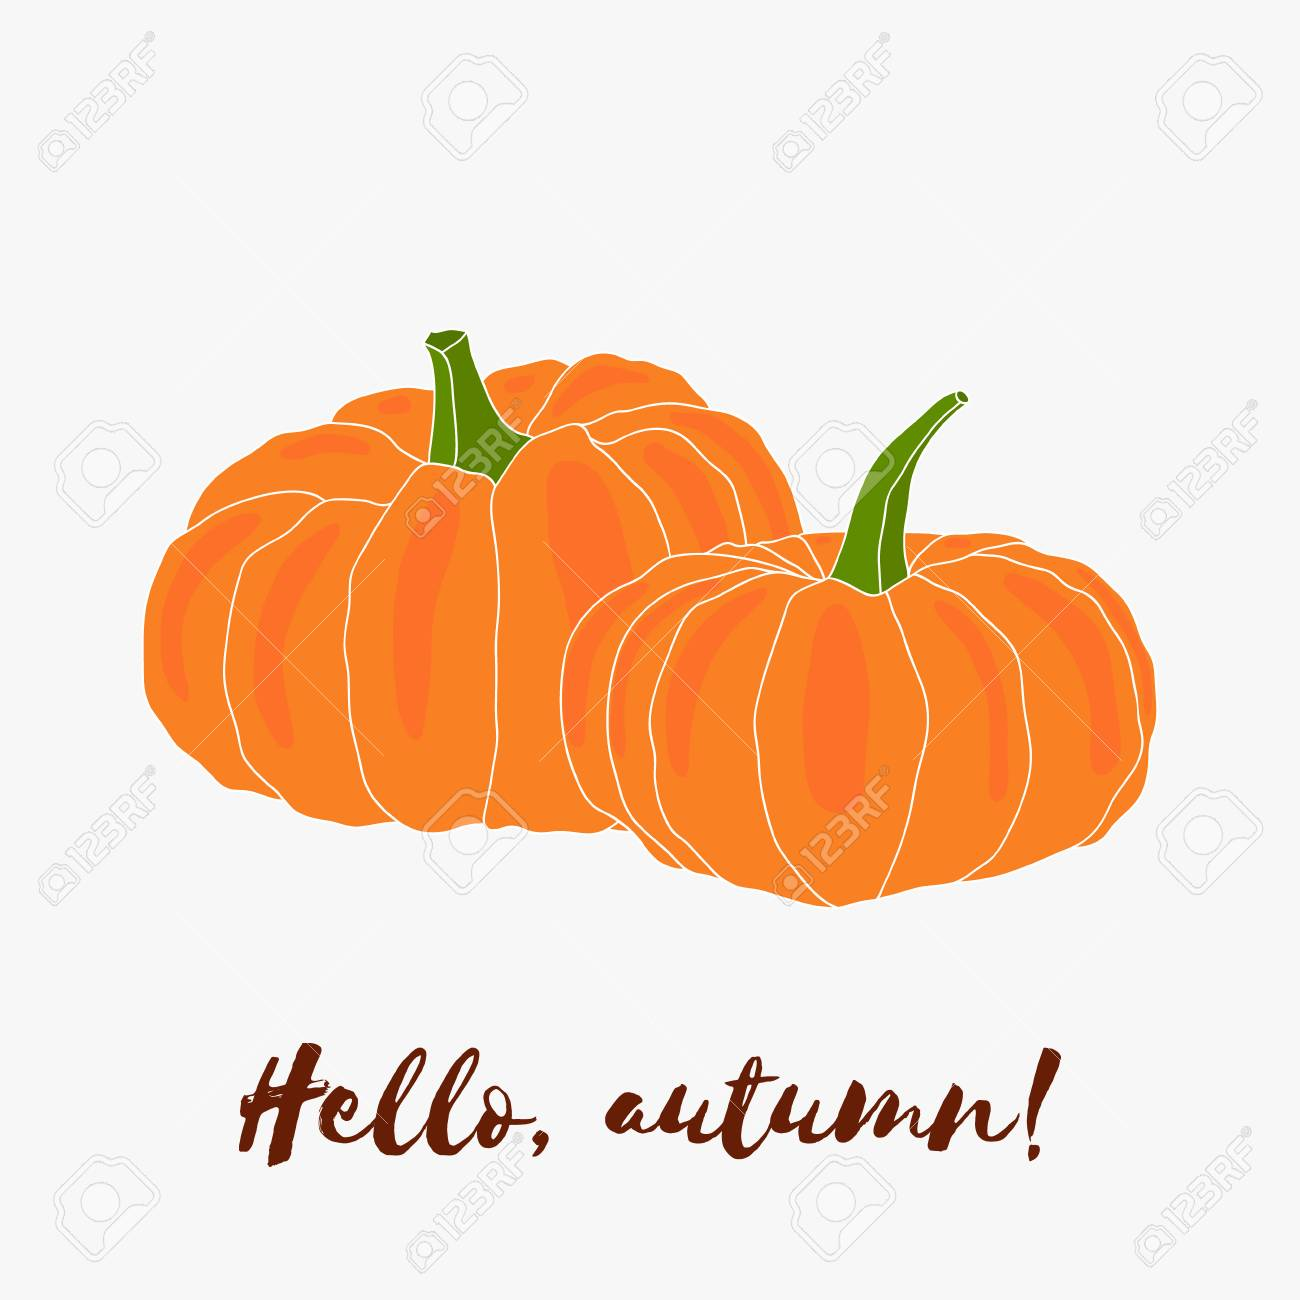 d5eb9c4551b Hello autumn! Hand drawn vector logo with lettering. Autumn halloween  decoration, vegetable harvest